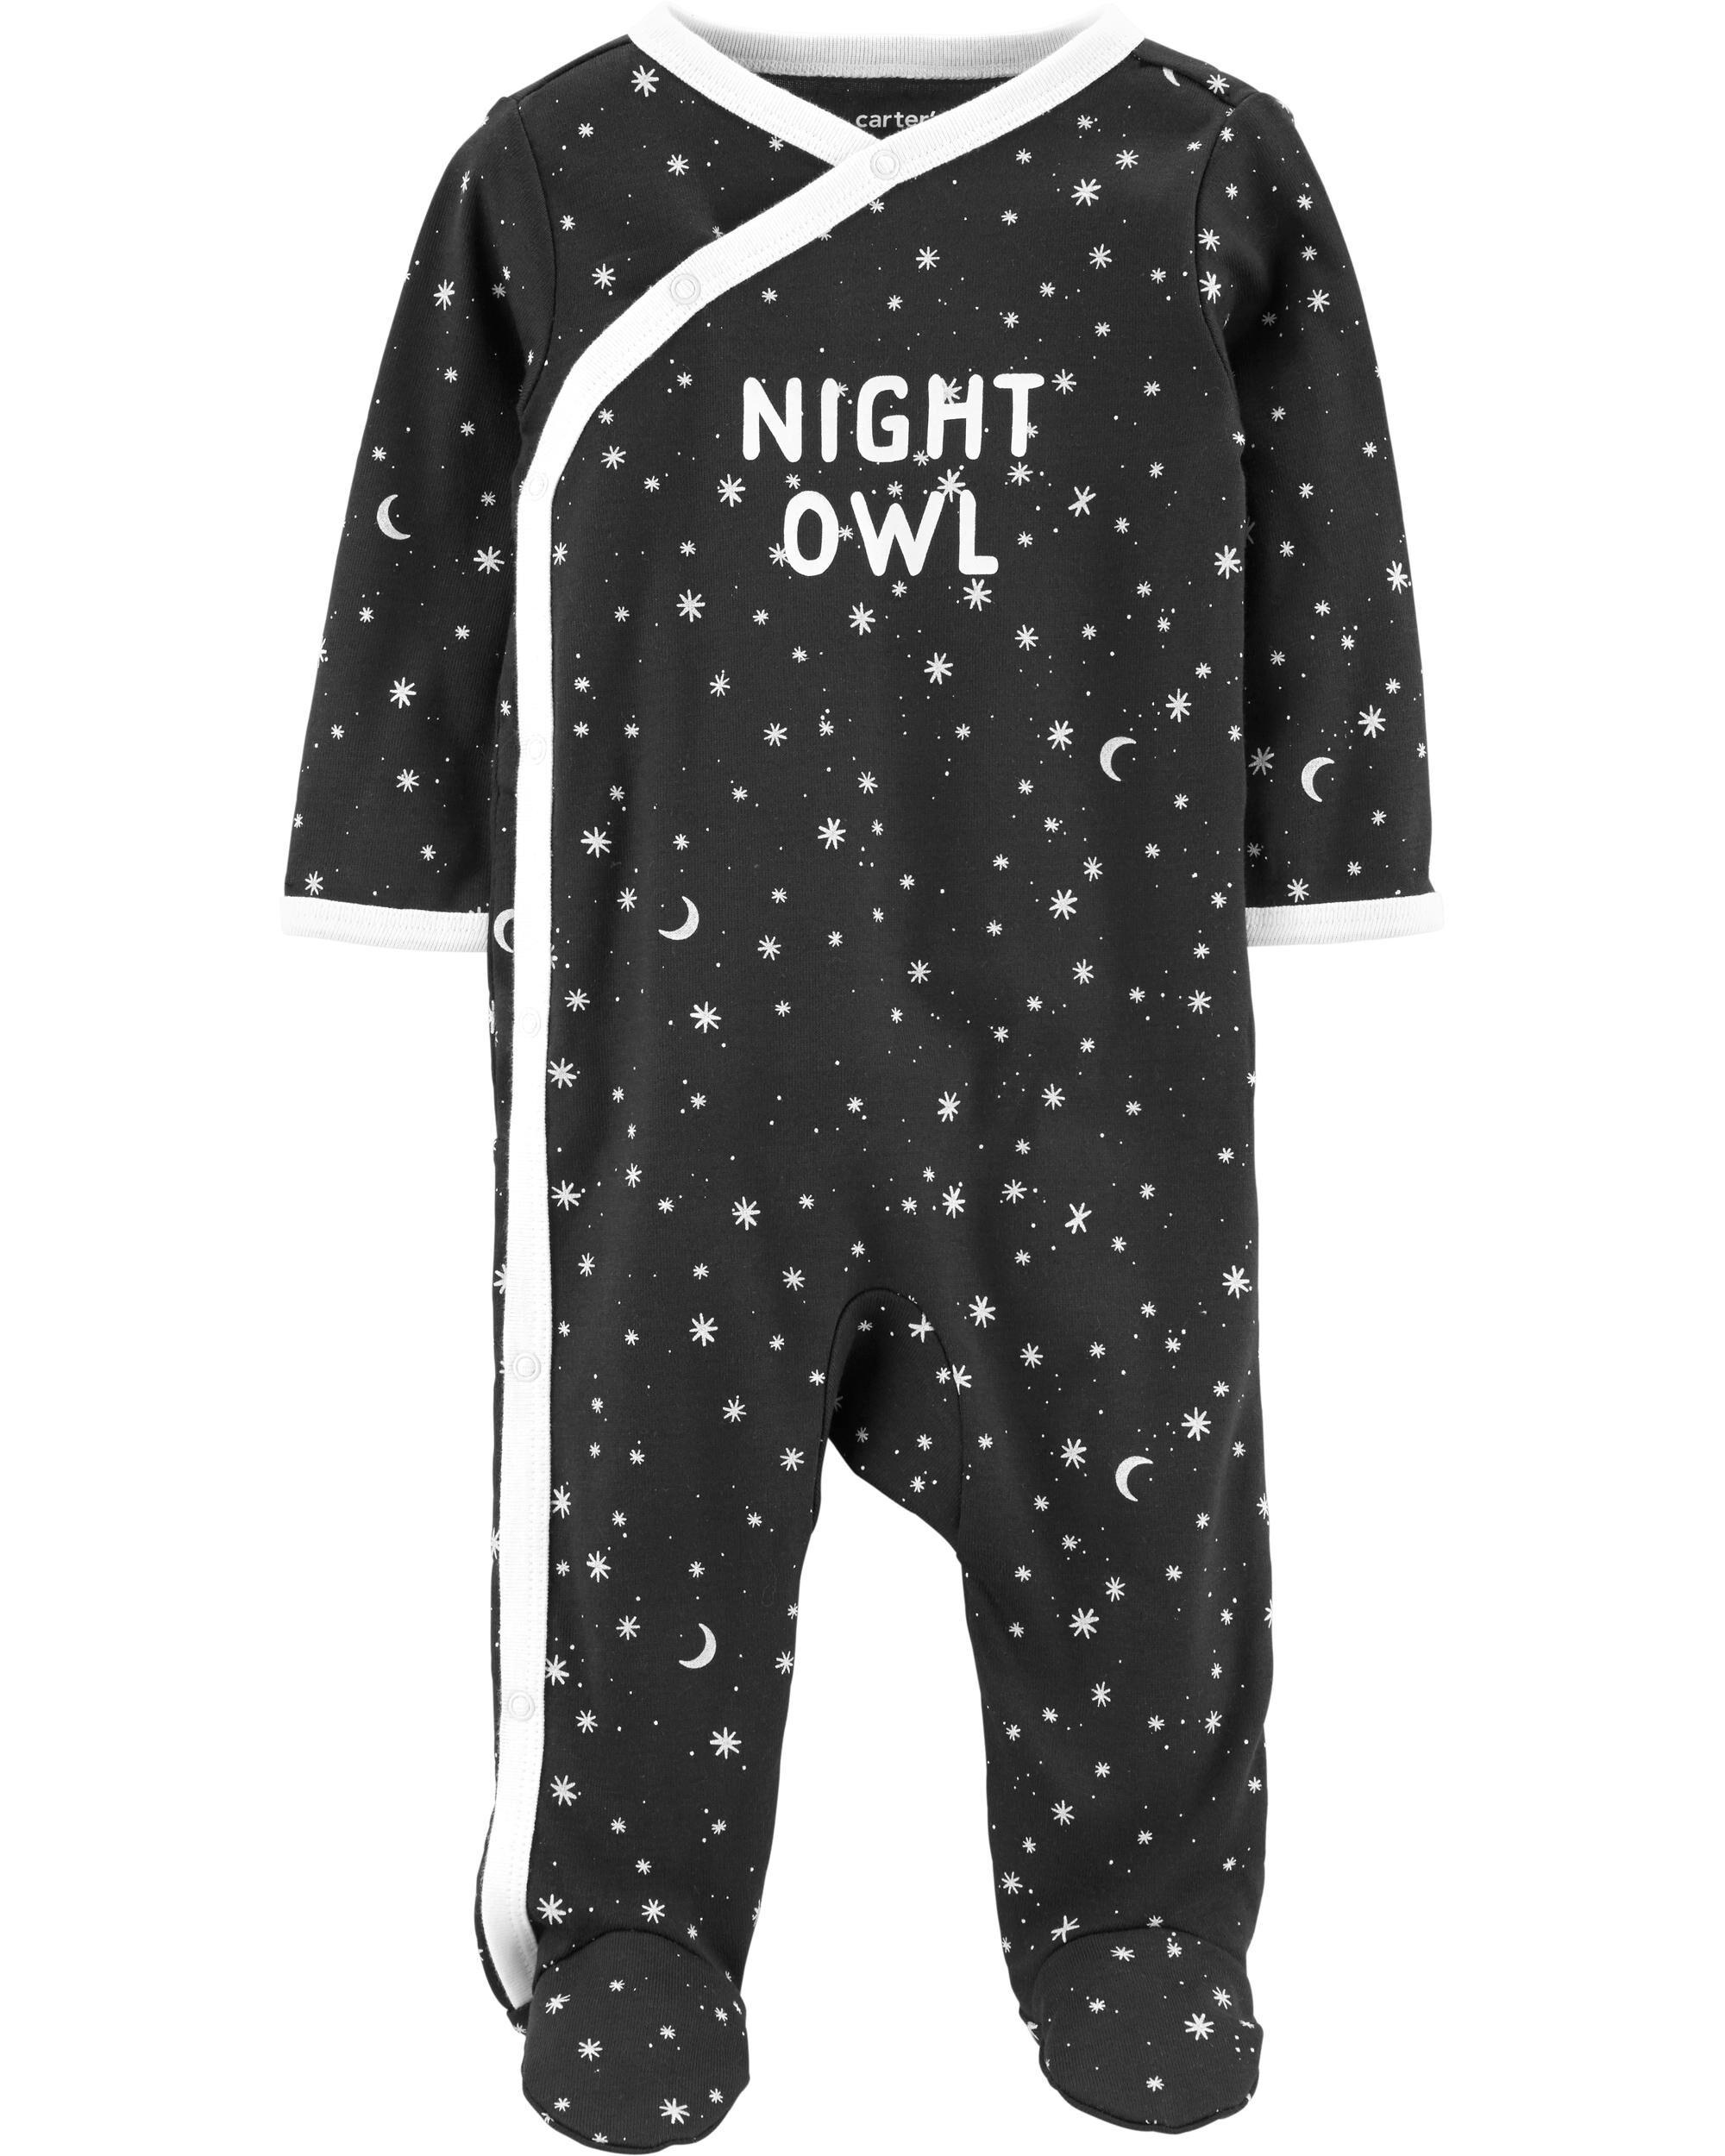 *CLEARANCE* Night Owl Side-Snap Cotton Sleep & Play